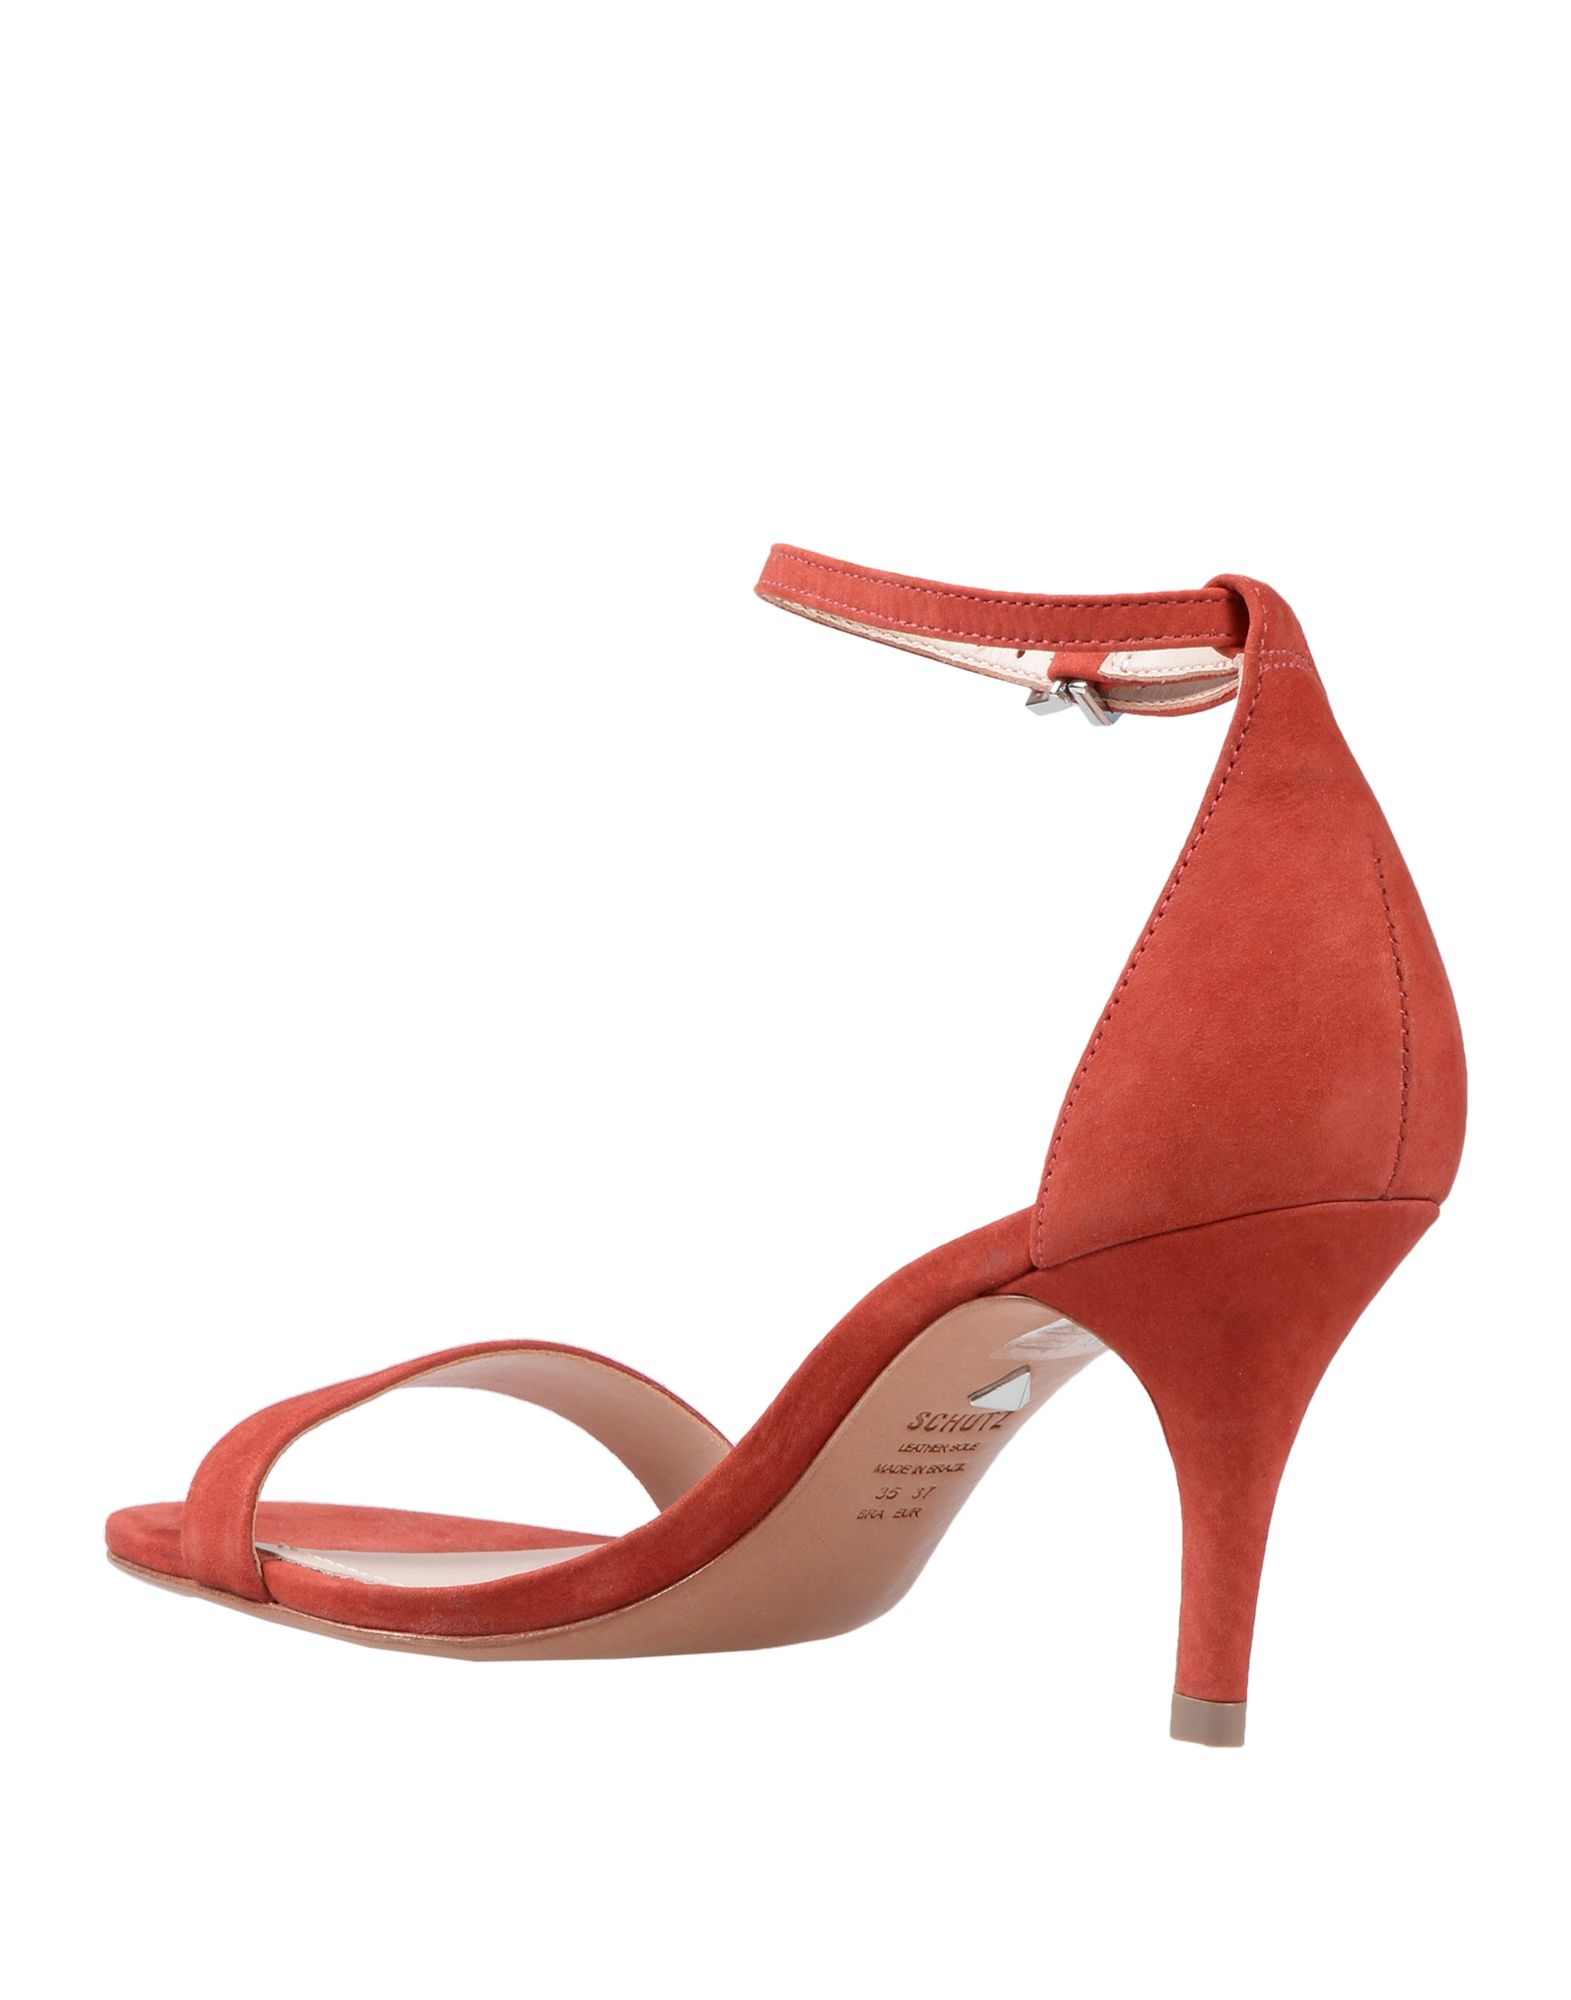 Stilvolle billige Schuhe Damen Schutz Sandalen Damen Schuhe  11490082VC da01e1